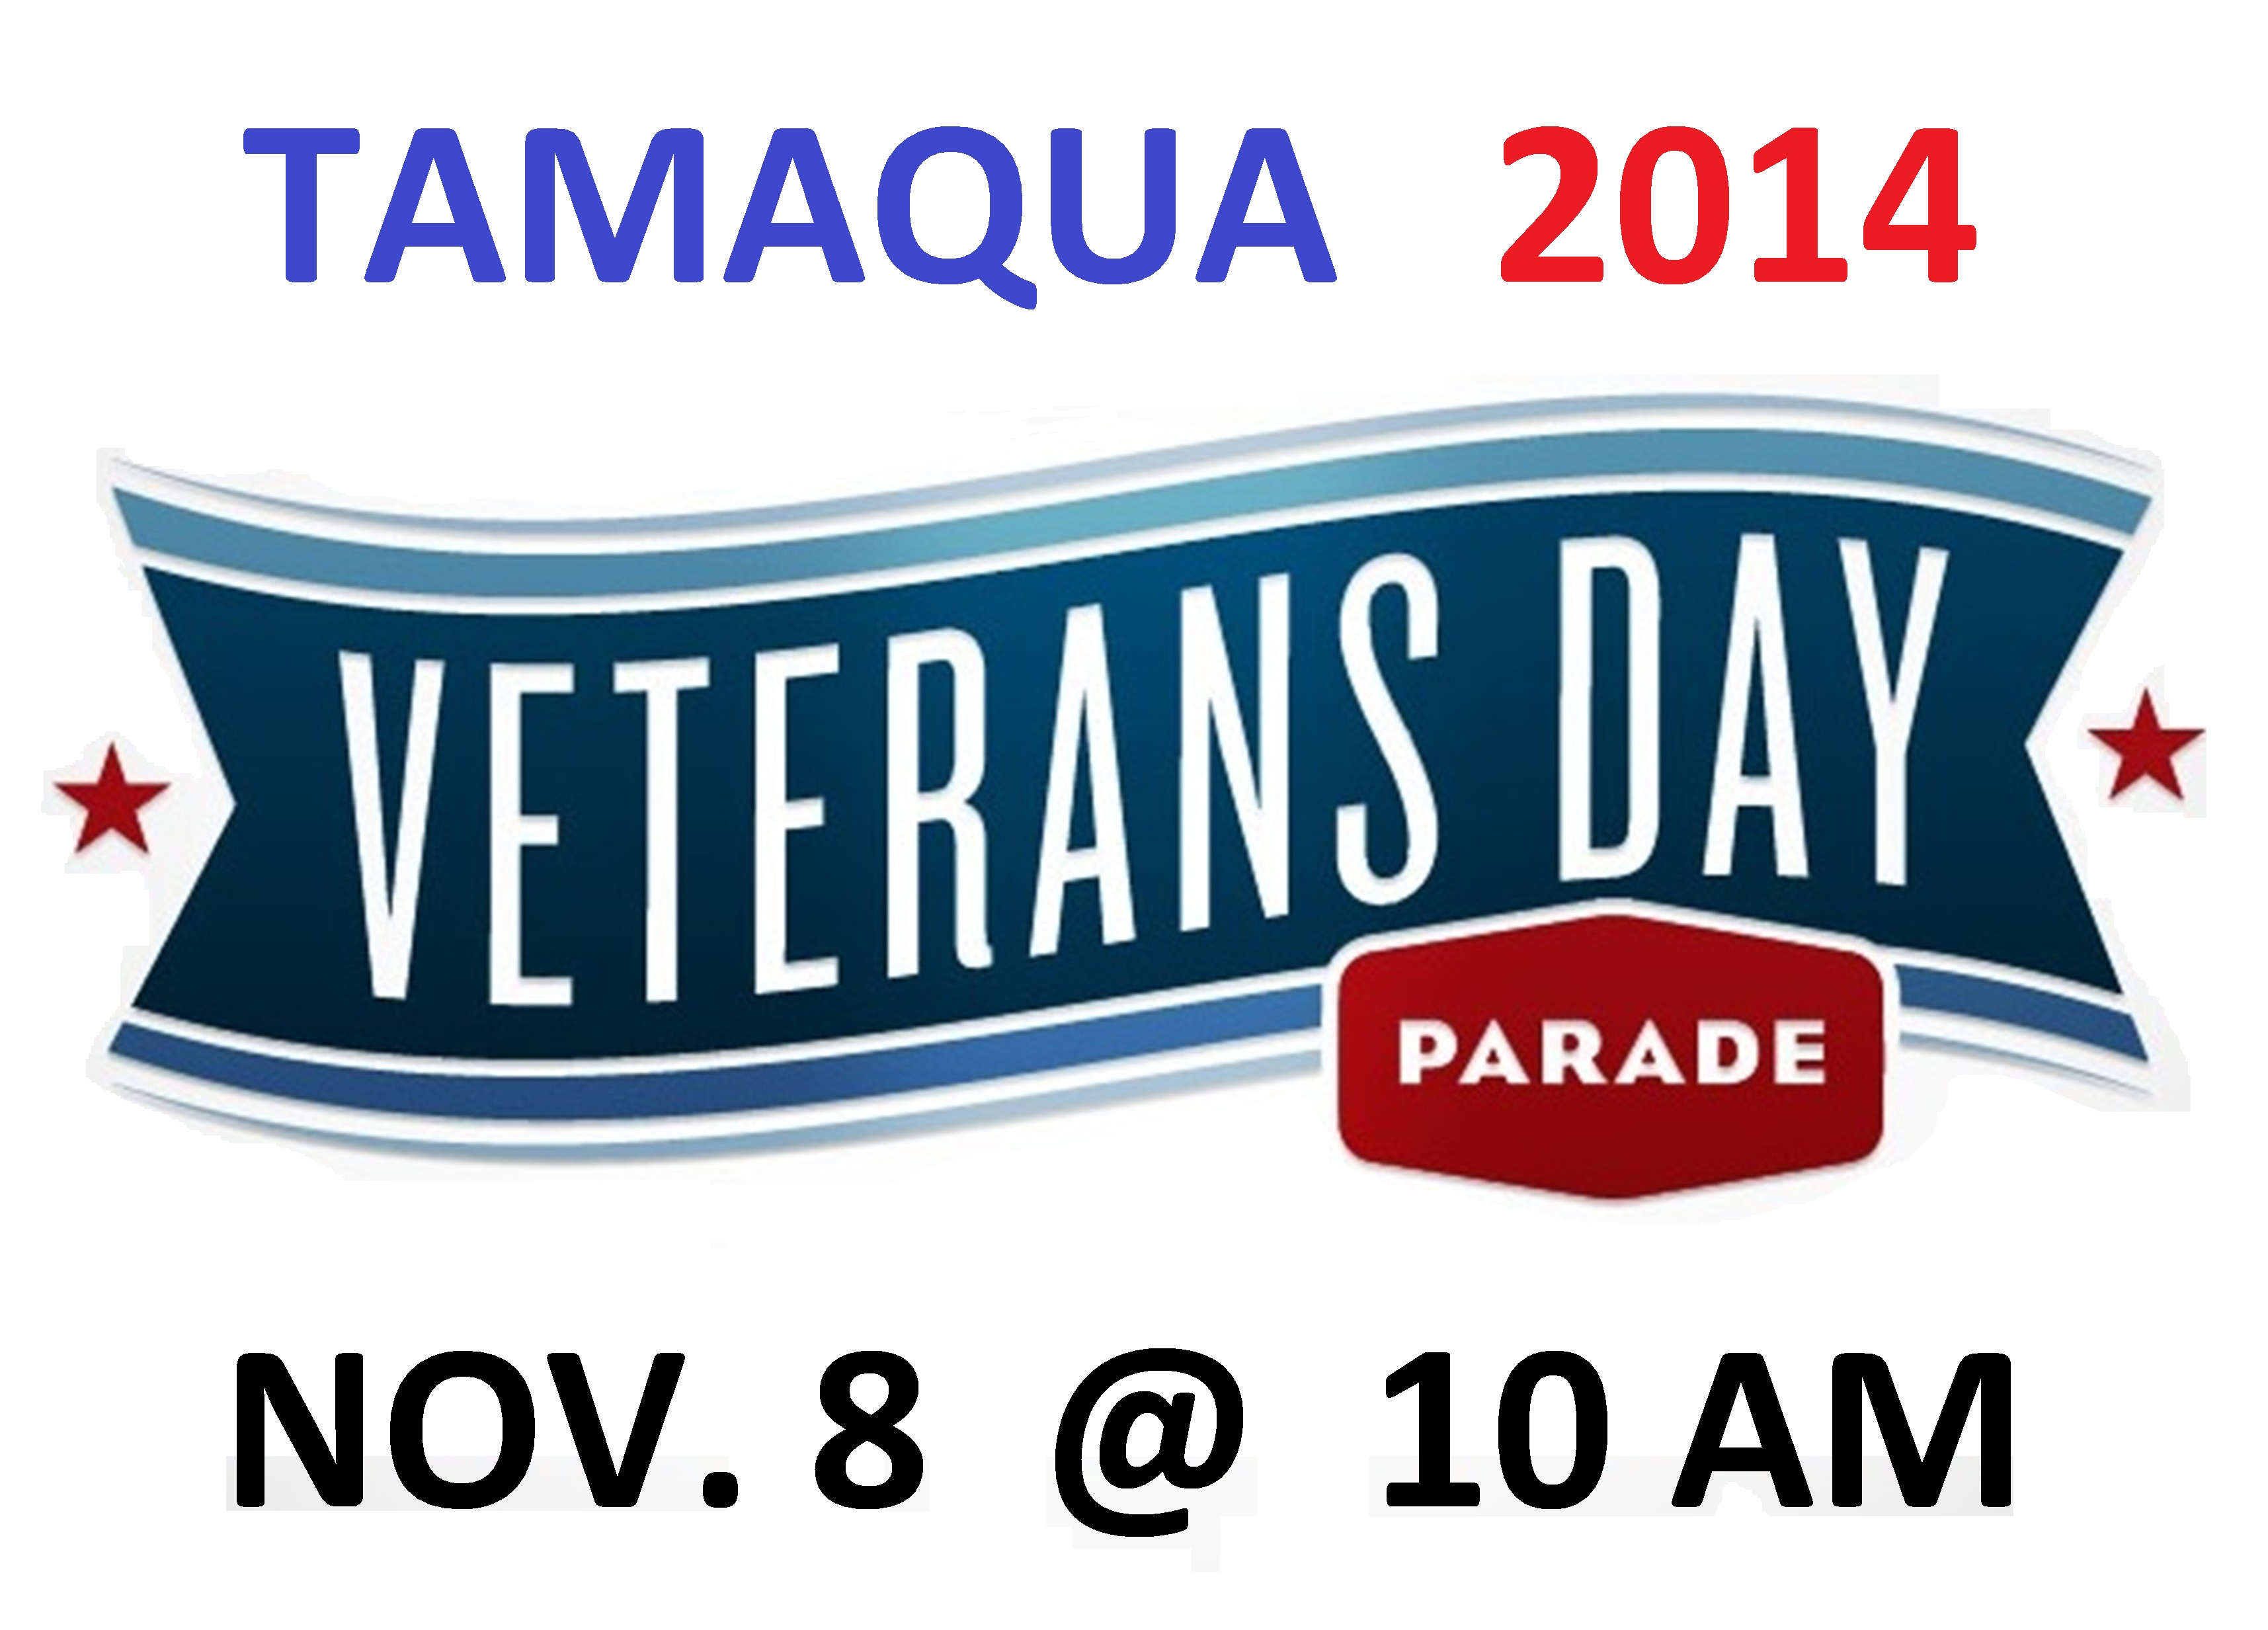 Veterans Day Logo 2014 Veterans Day Parade Logo